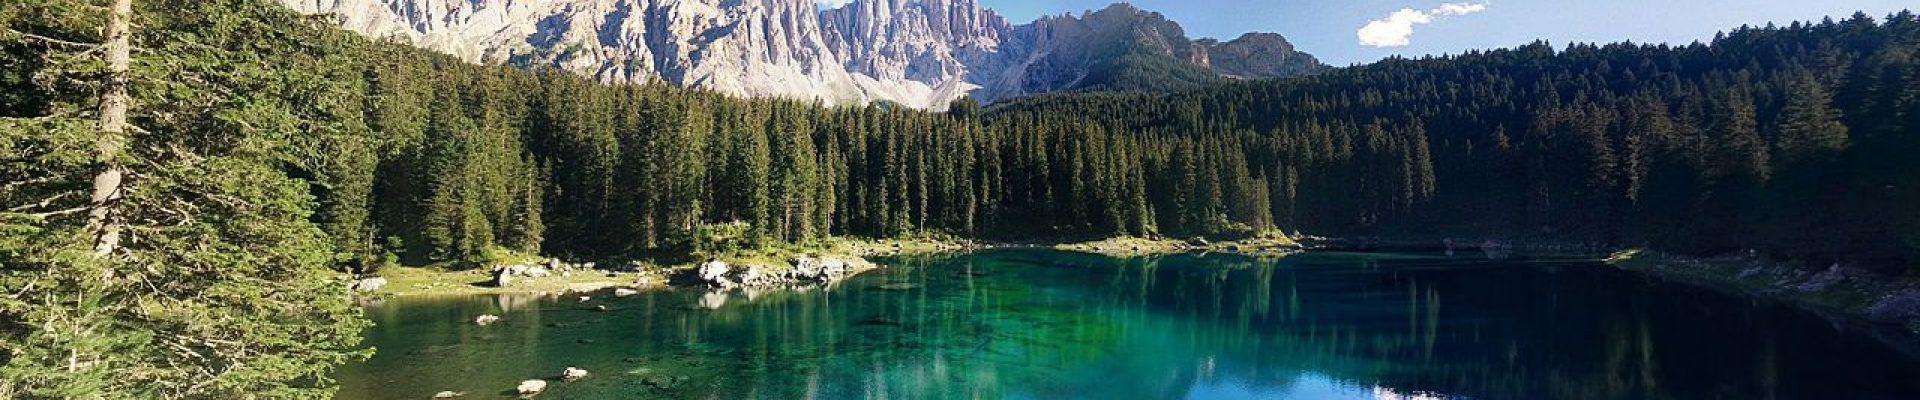 Lago_di_Carezza_-_Latemar